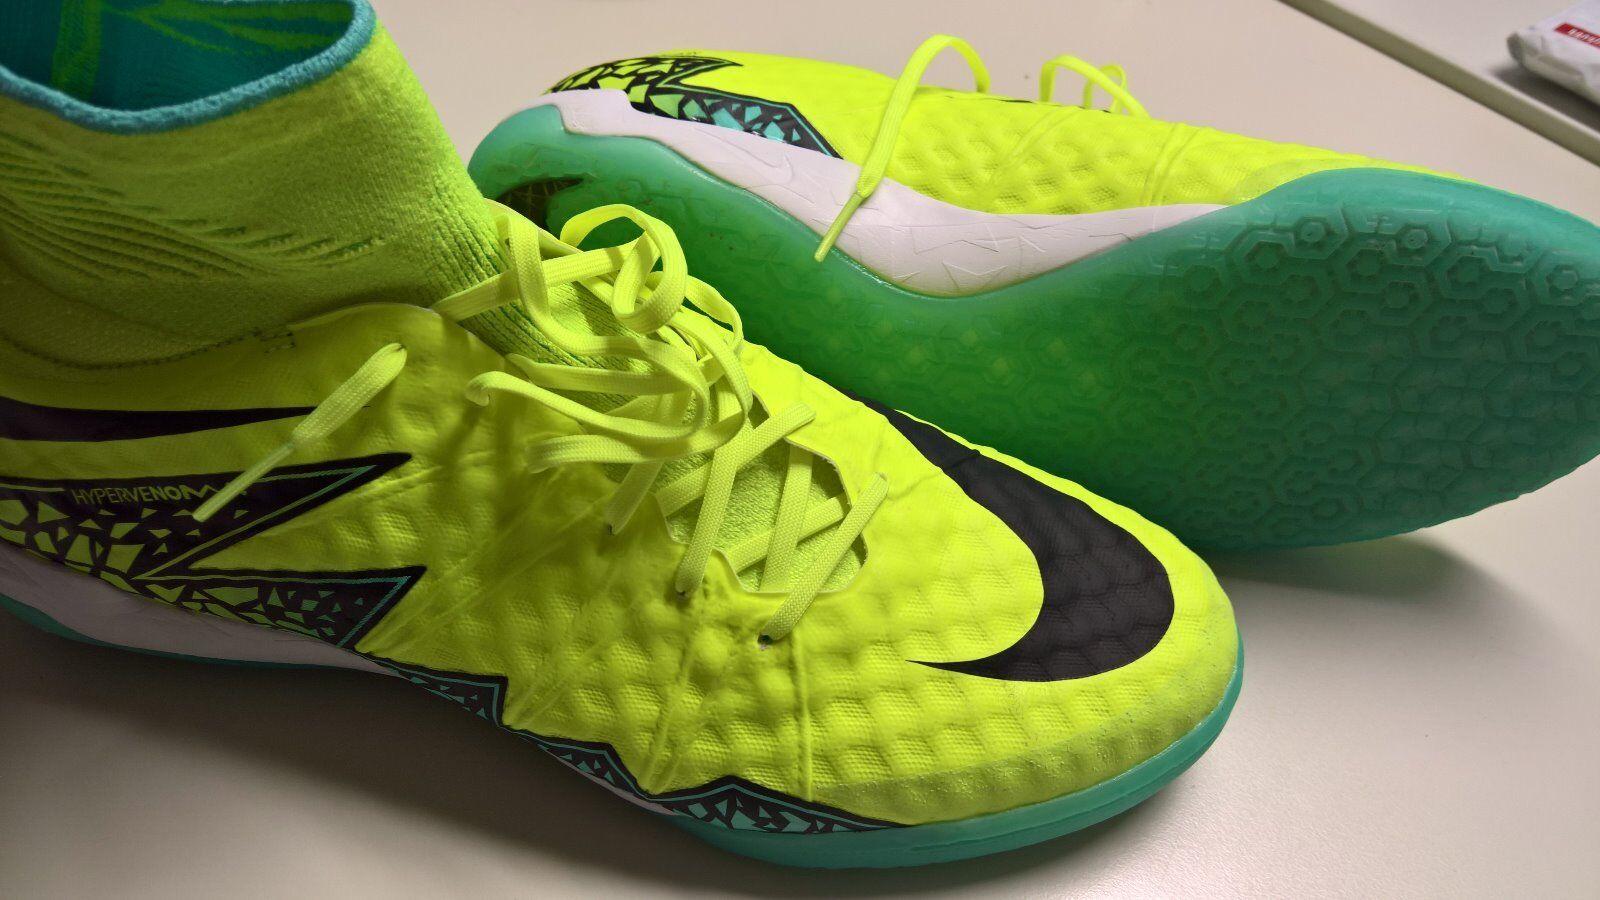 Nike hypervenom x próximo II Street IC   44,5   amarillo   halle   zapatos de fútbol